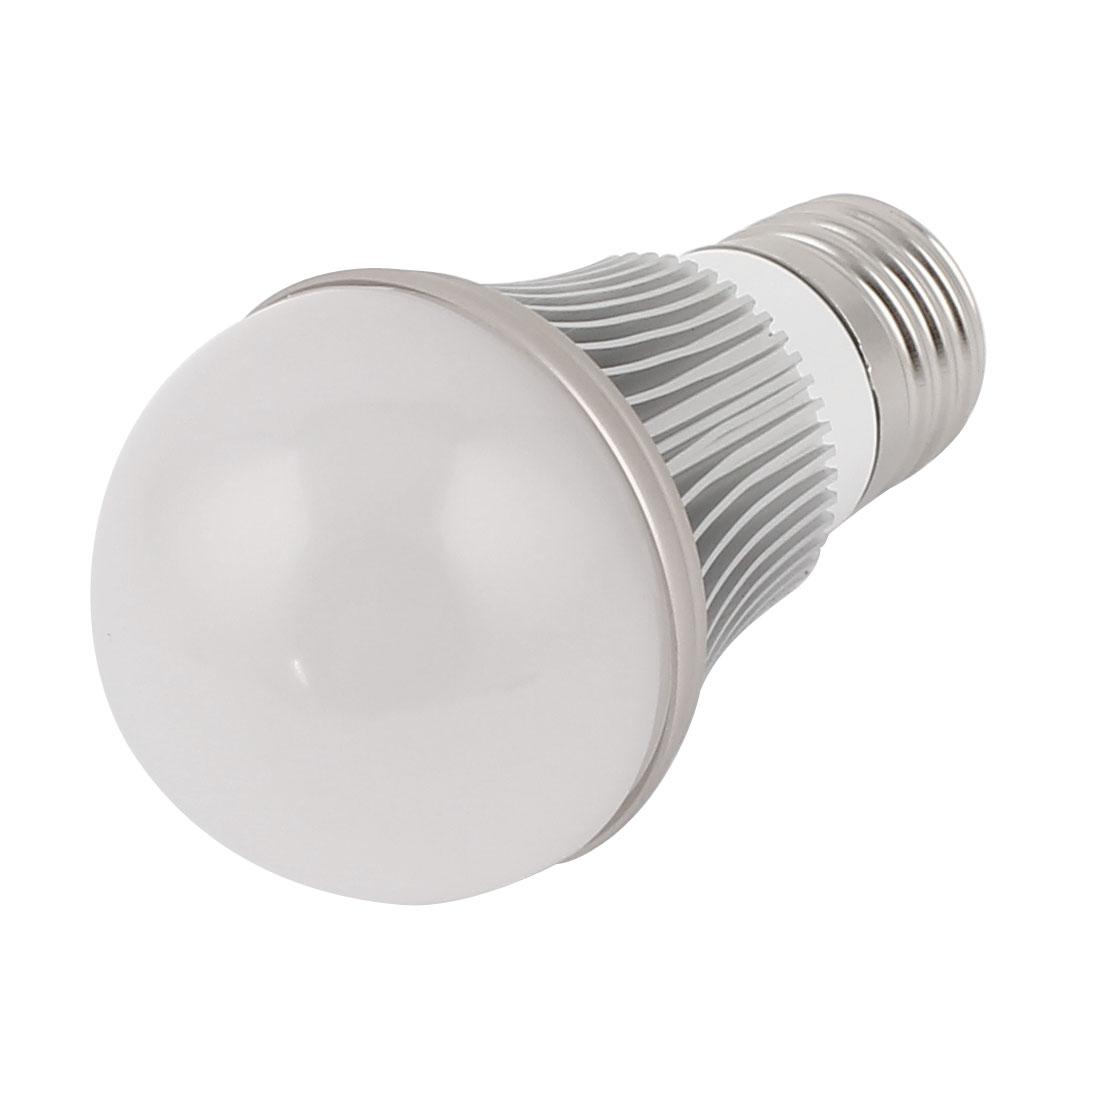 3W Silver Tone E27 50mm Dia Globe Ball Bulb Lamp Shell LED Aluminum Heatsink